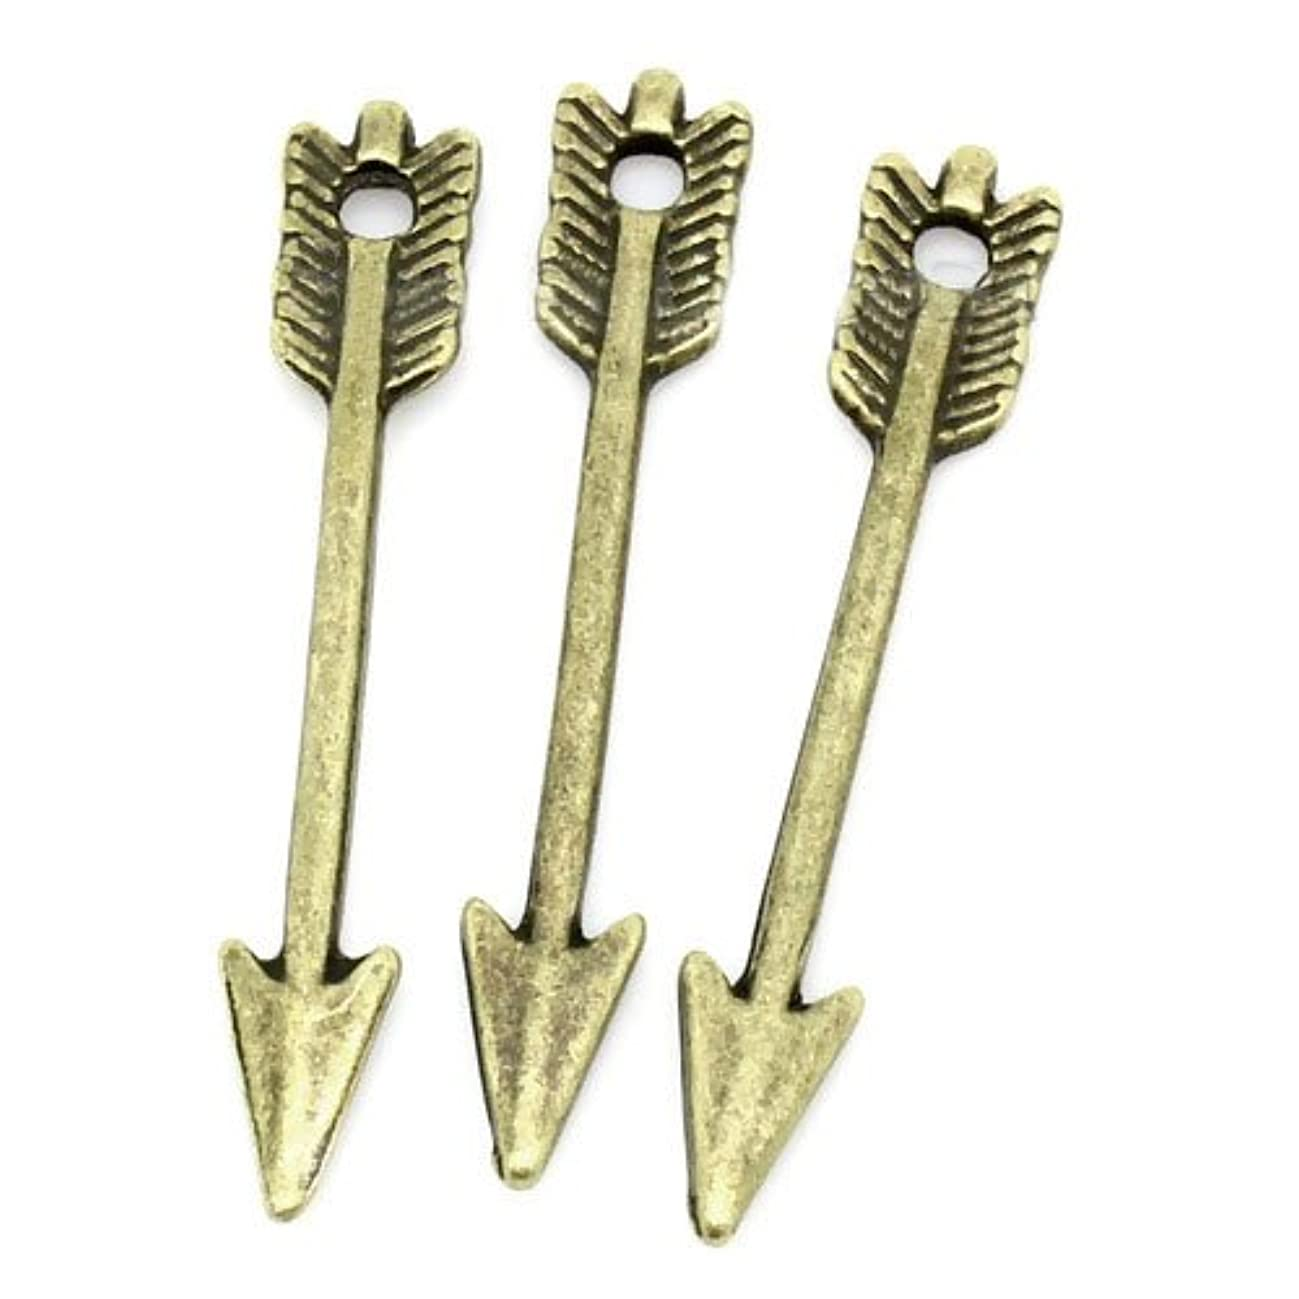 95 PC Bronze Tone Tibetan Arrow Charm Pendants 29x5mm, Jewelry Making DIY Steampunk